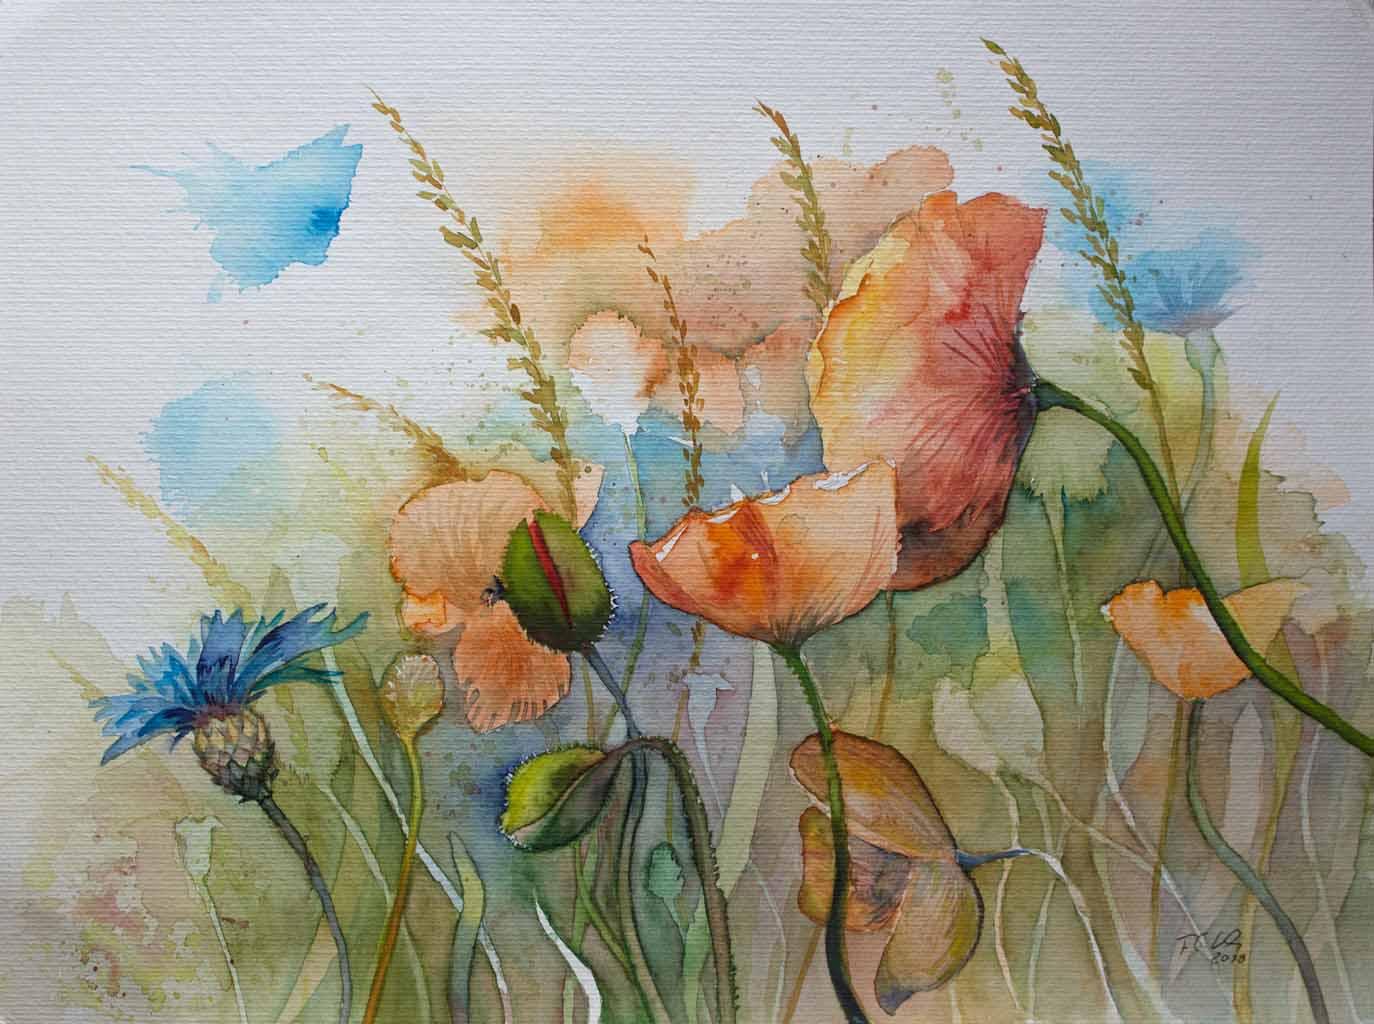 Mohnblüten am Feldrand (c) Aquarell von Frank Koebsch